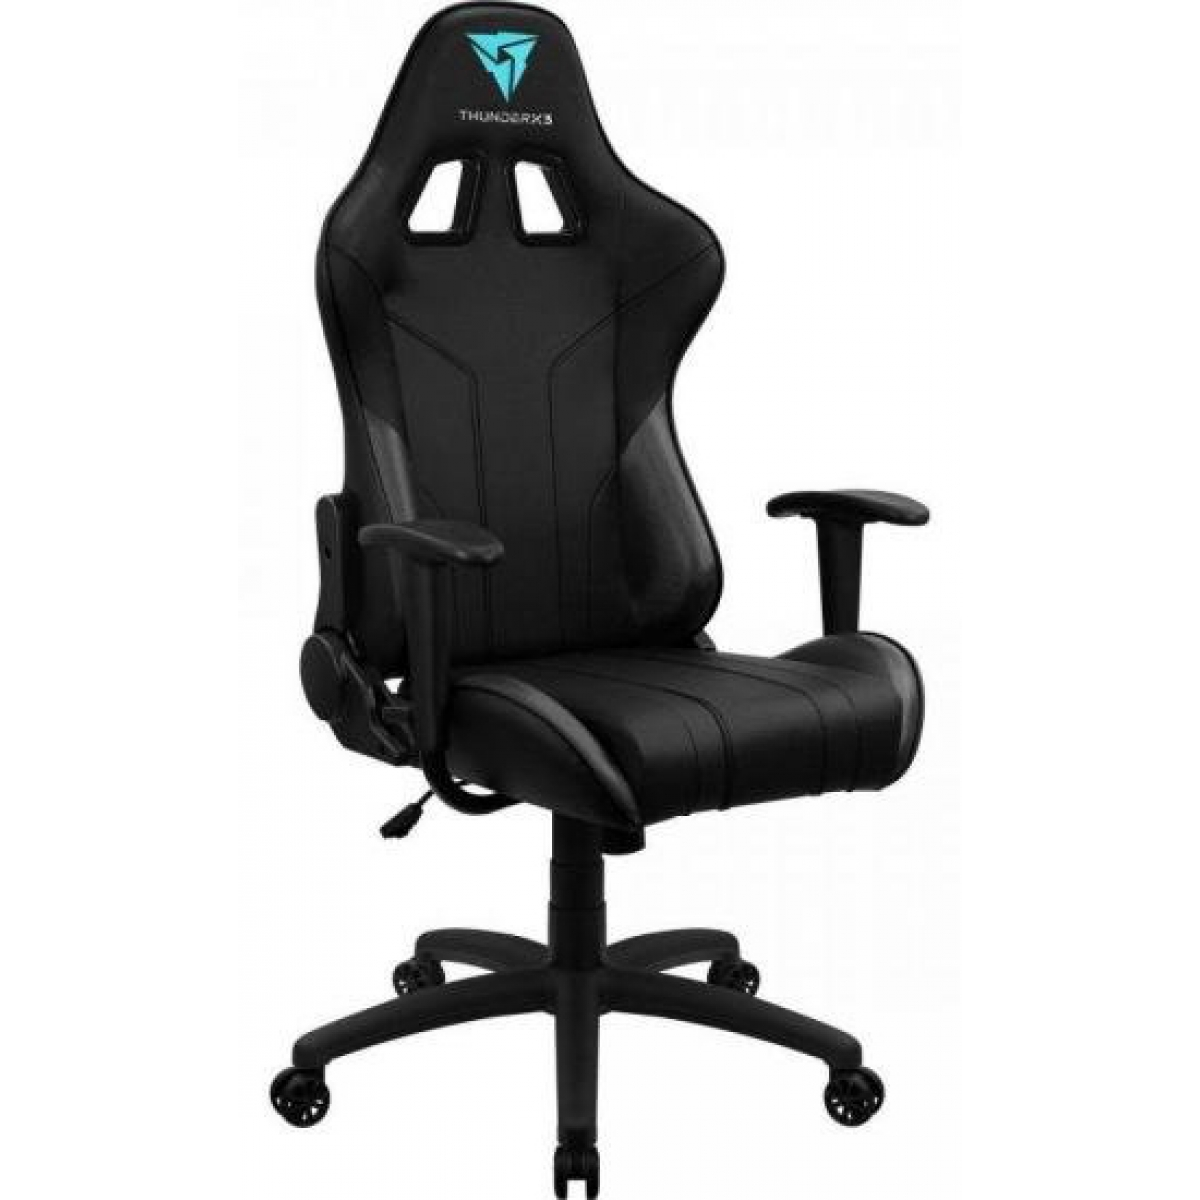 Cadeira Gamer ThunderX3 EC3, AIR Tech, Black